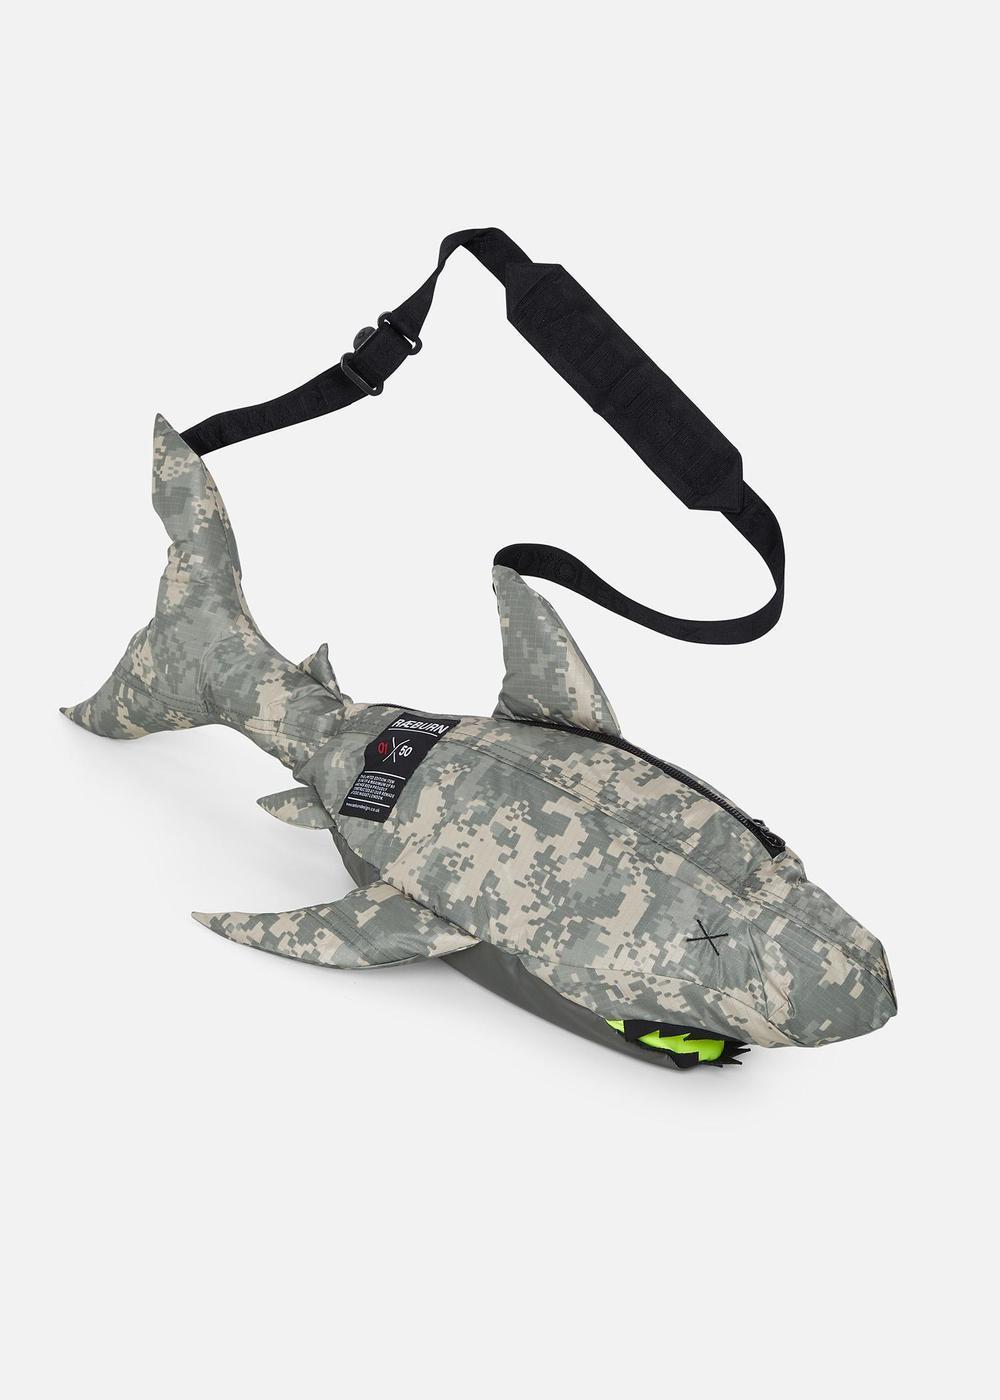 Raeburn ACU HI-VIS SHARK BAG